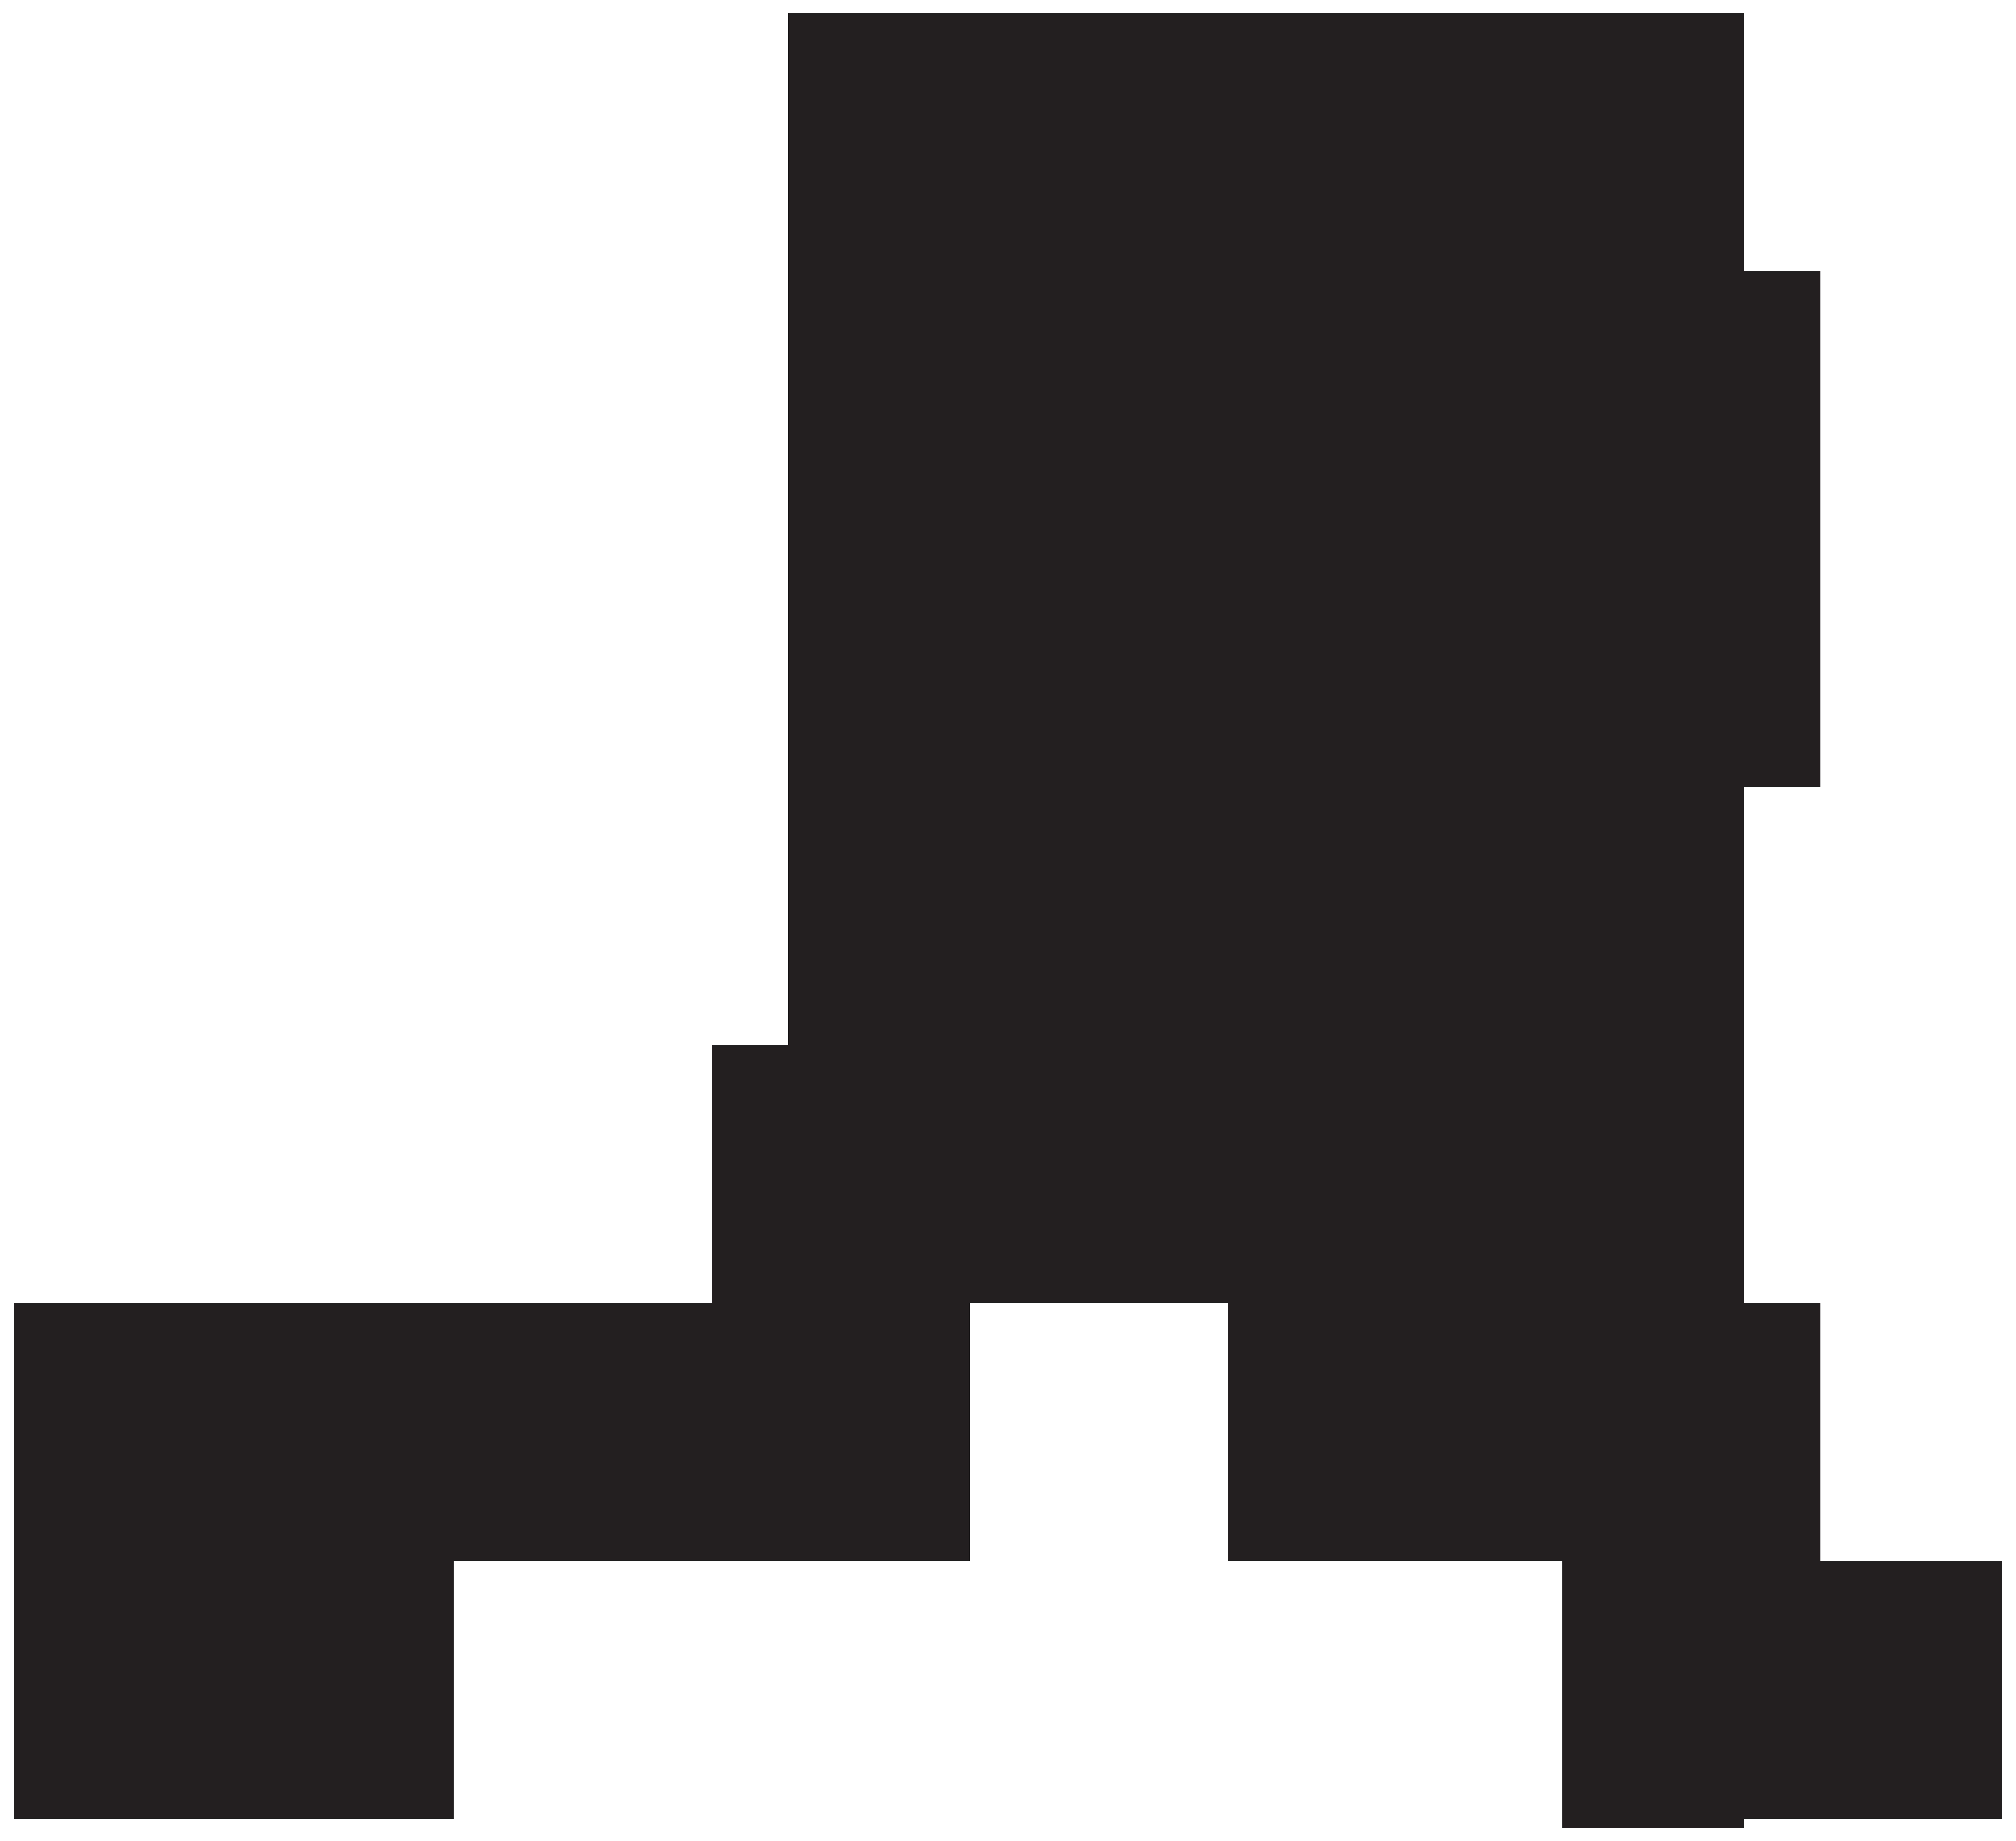 8000x7307 Hockey Player Silhouette Png Clip Artu200b Gallery Yopriceville